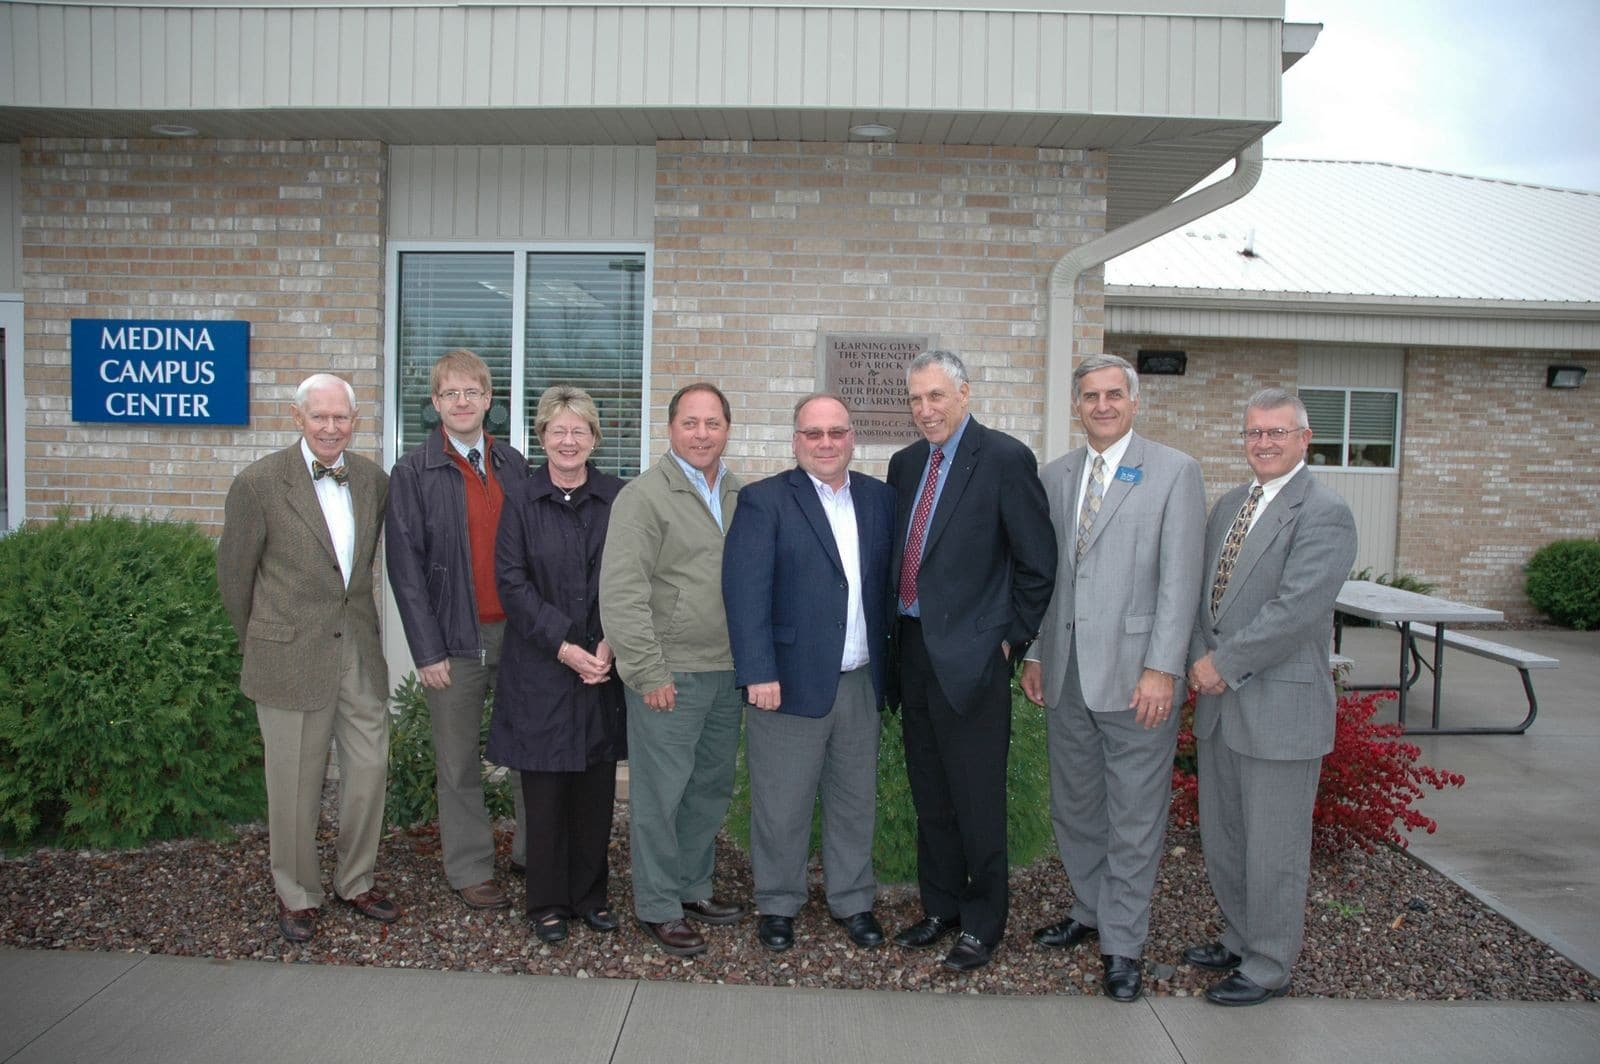 Genesee Community College Citation, Oct. 2010